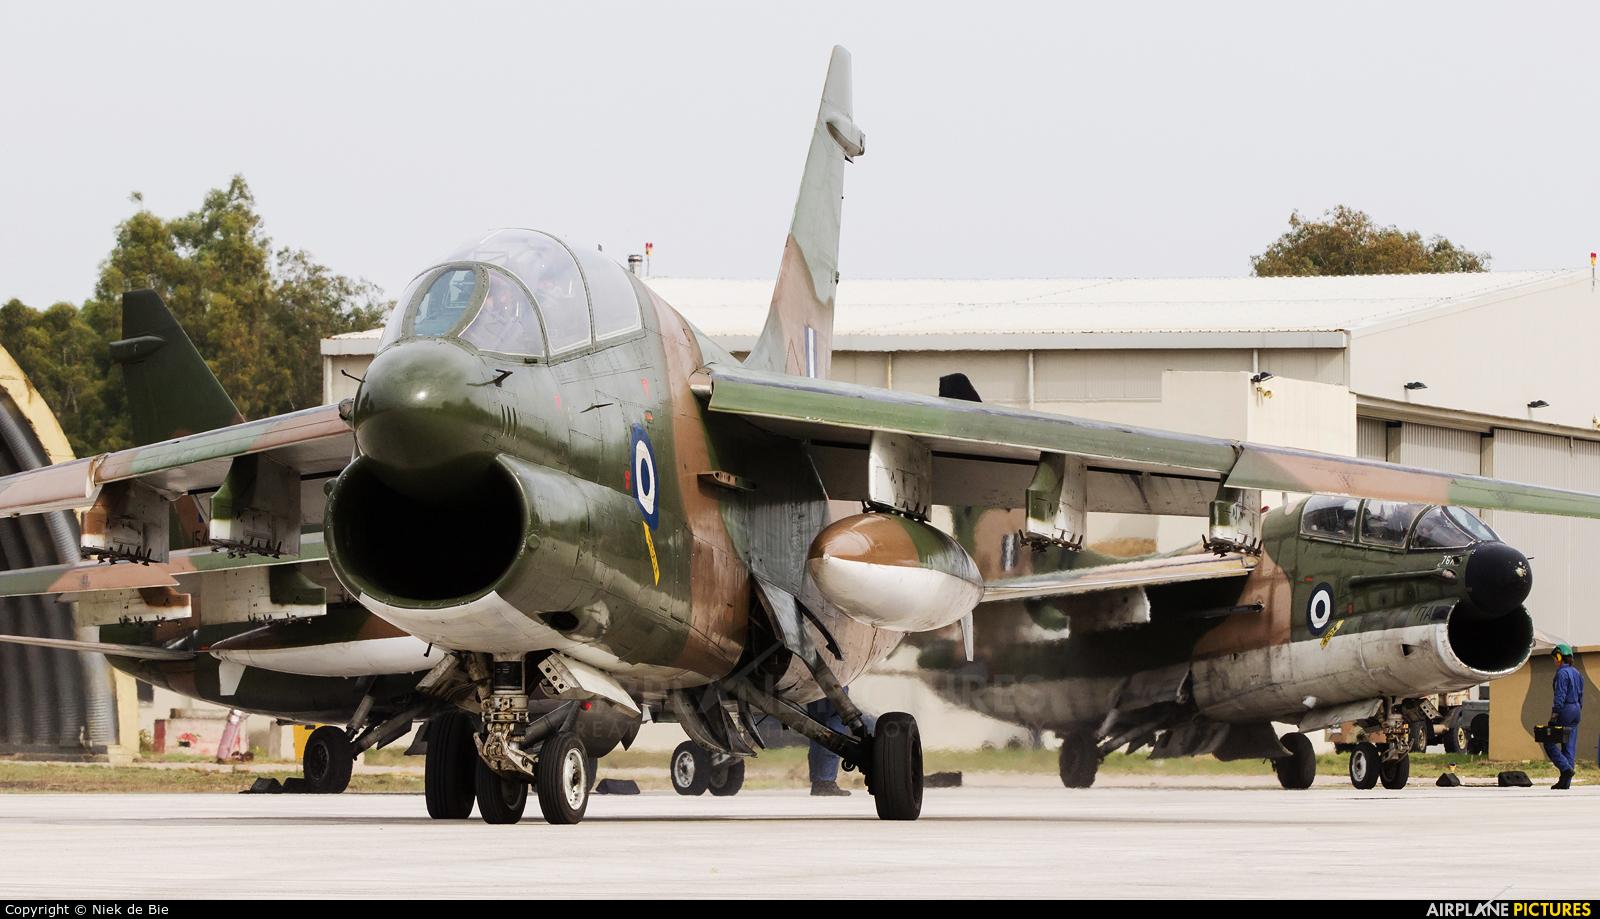 Greece - Hellenic Air Force 156753 aircraft at Araxos